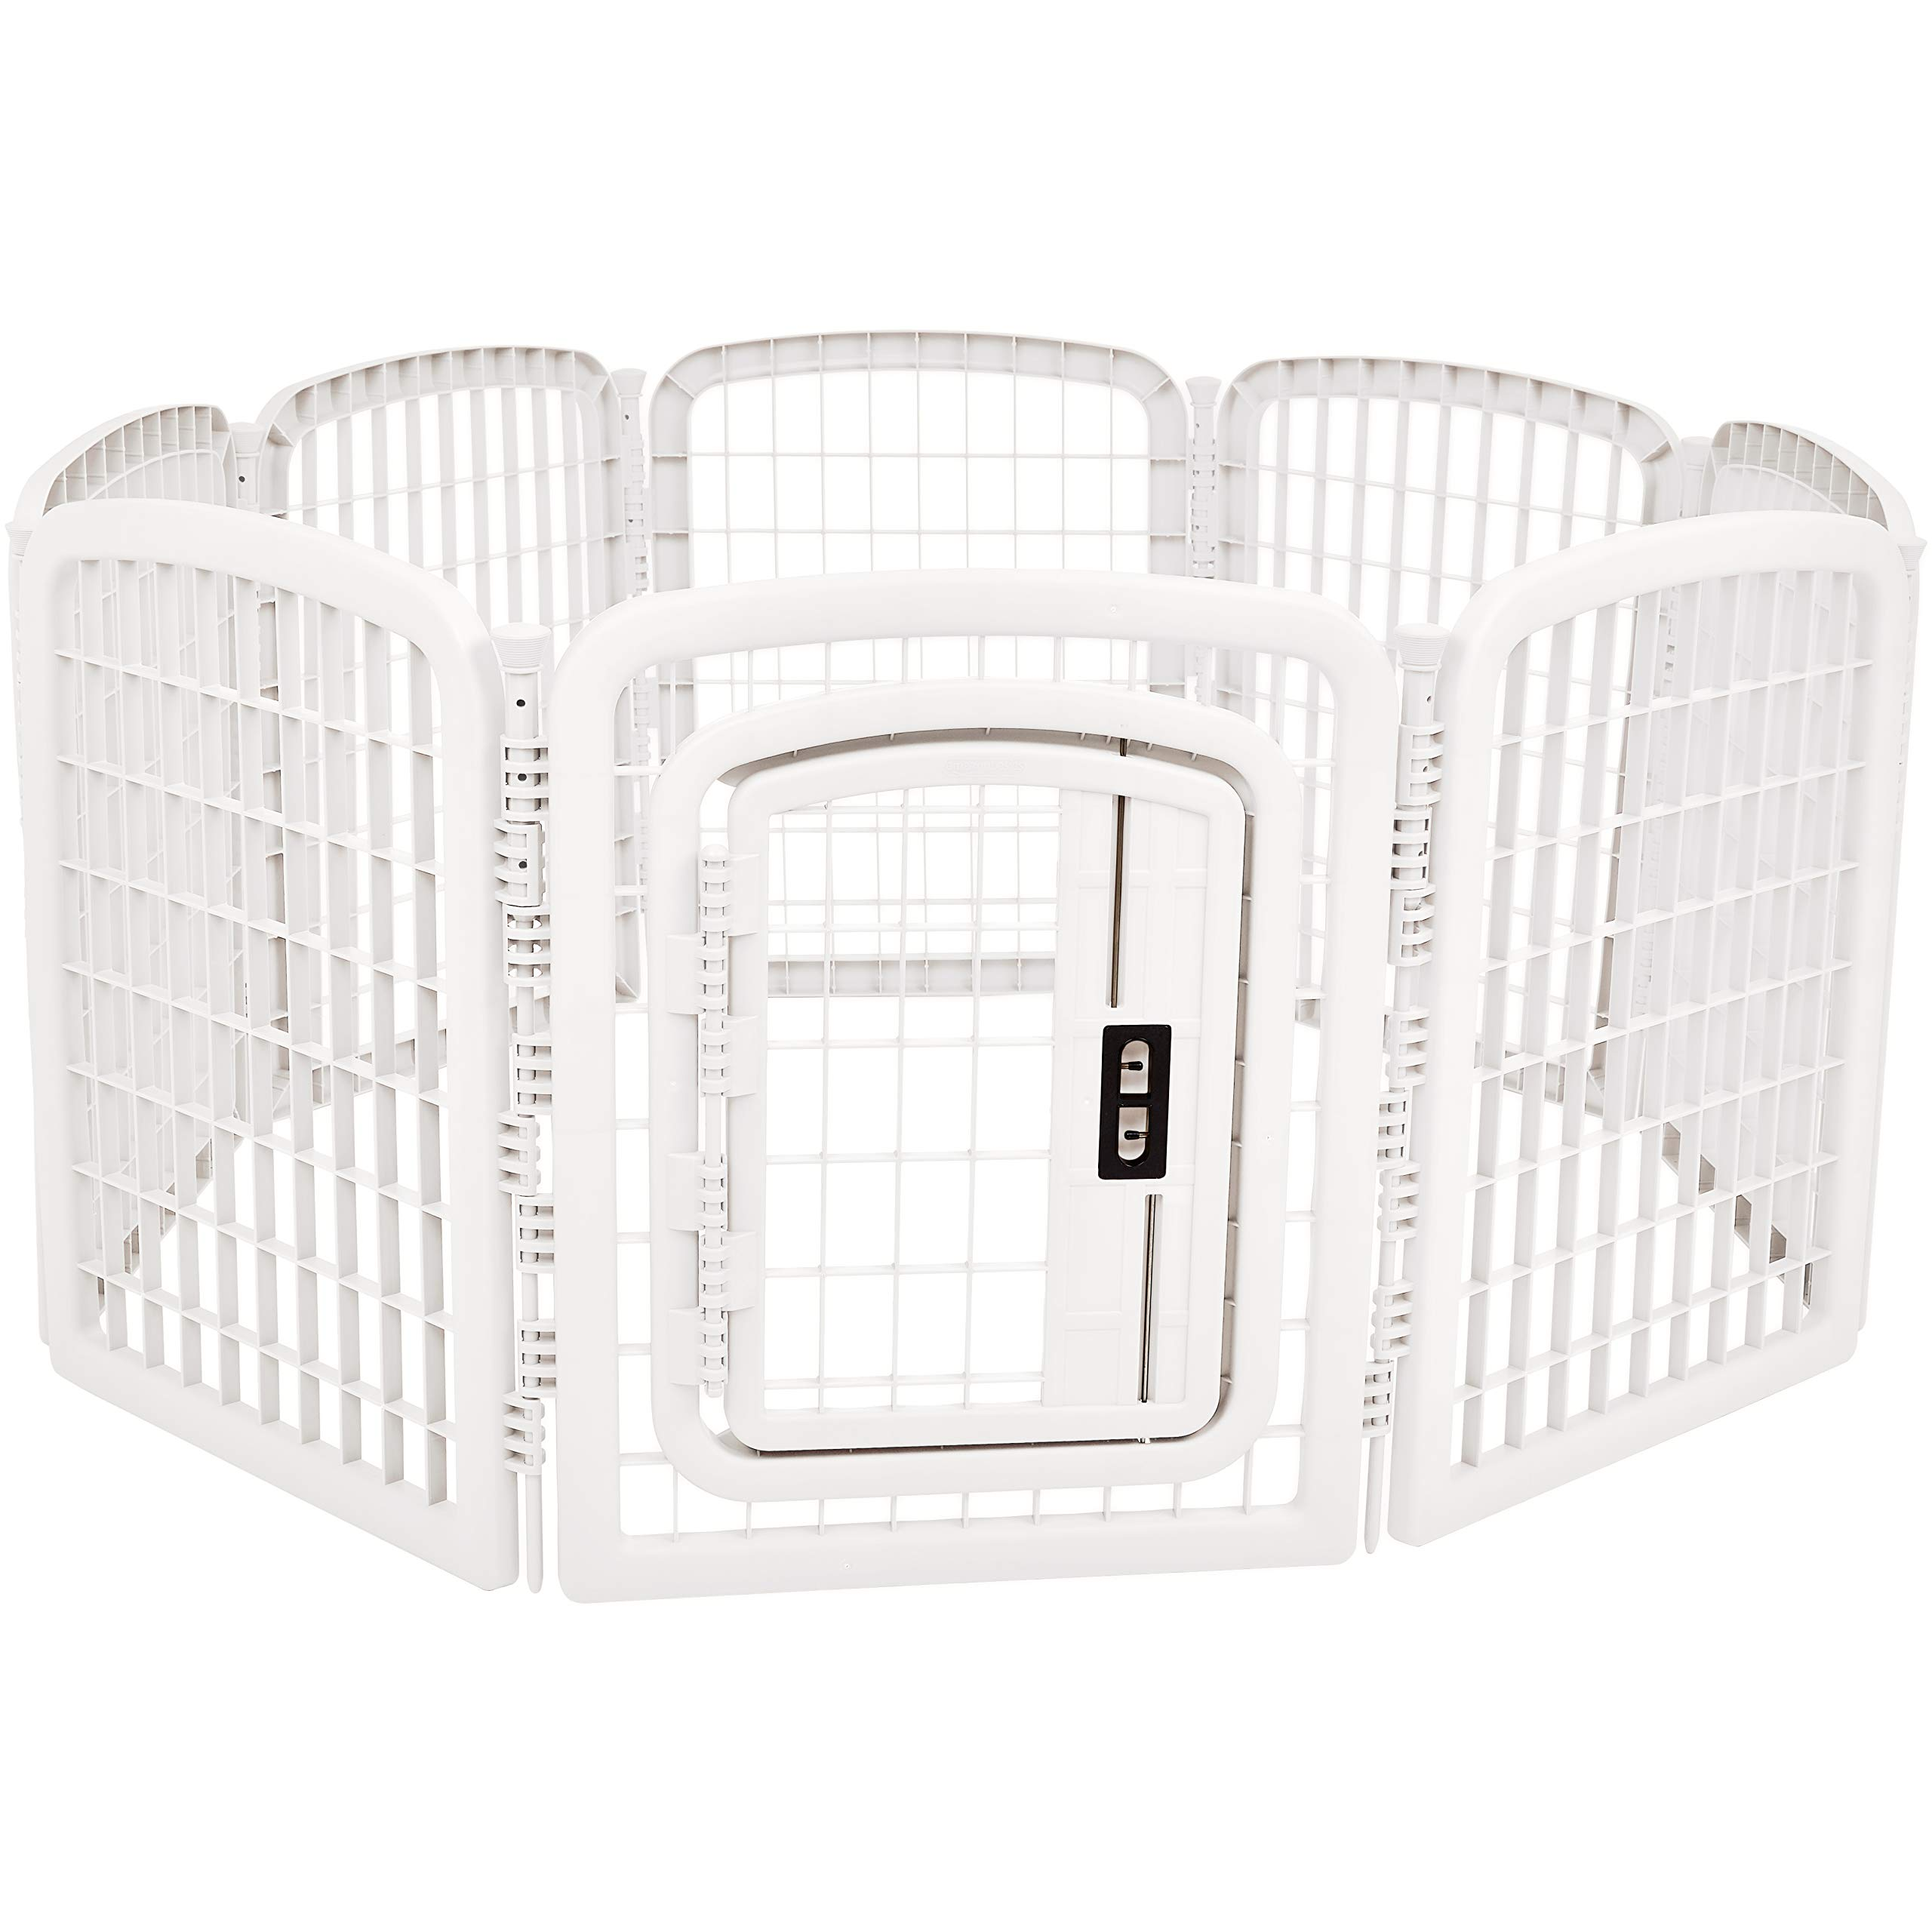 AmazonBasics 8-Panel Plastic Pet Pen Fence Enclosure With Gate - 59 x 58 x 28 Inches, White by AmazonBasics